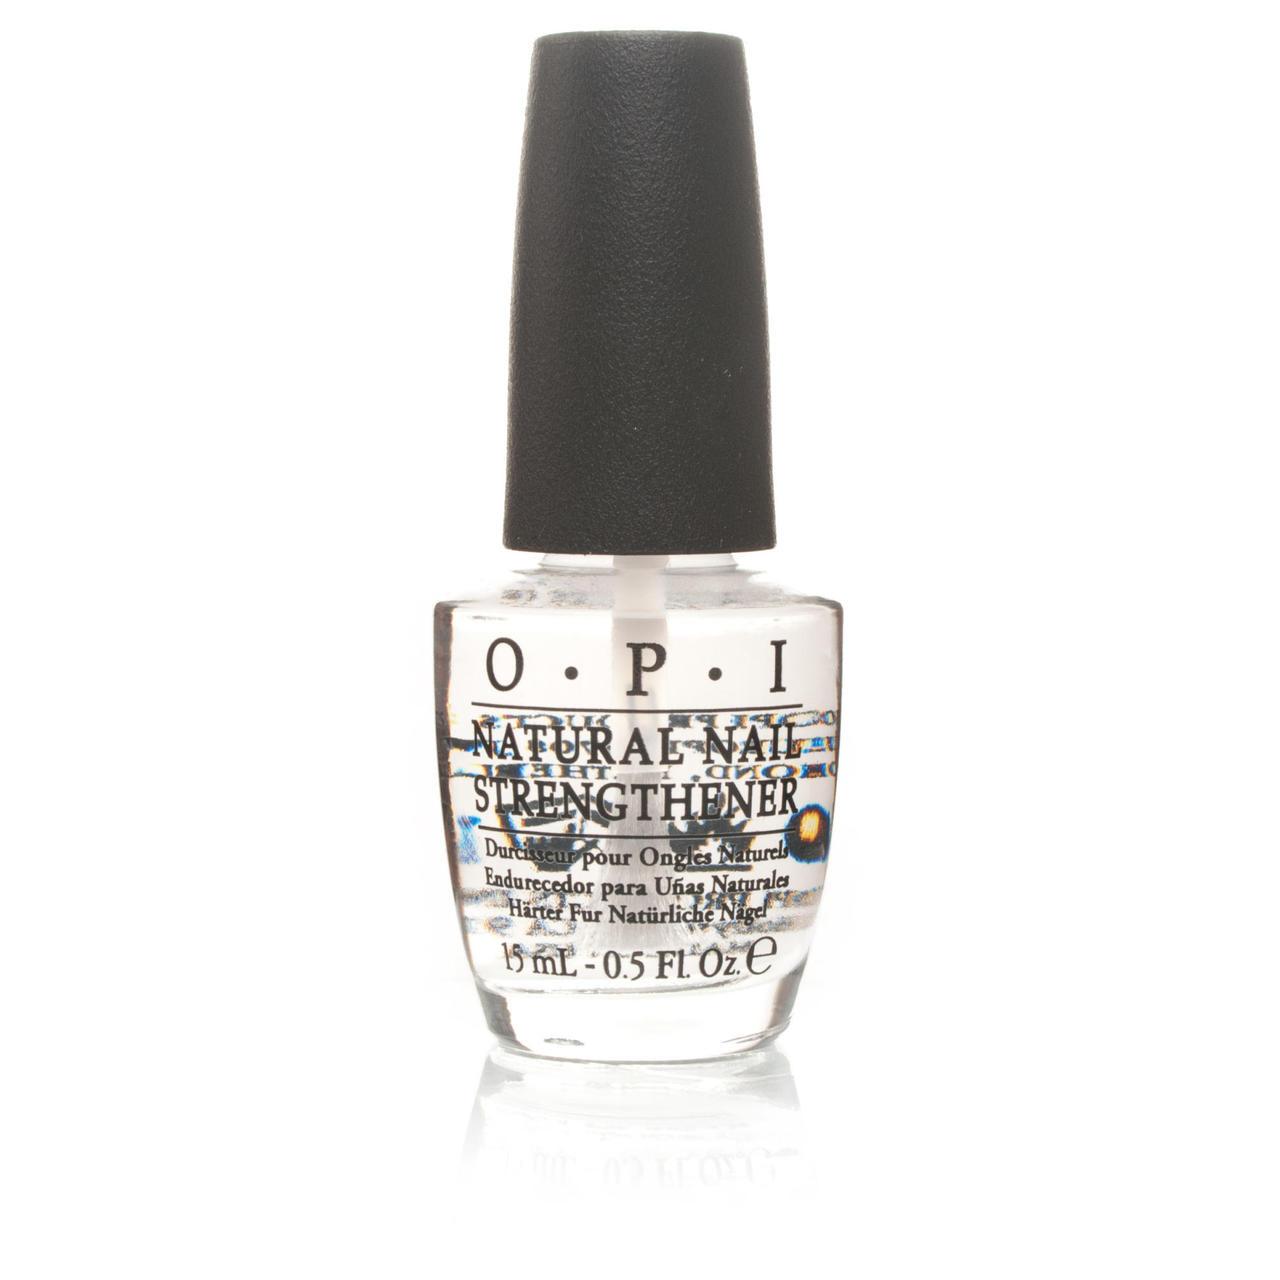 OPI Natural Nail Strengthener - Westside Beauty